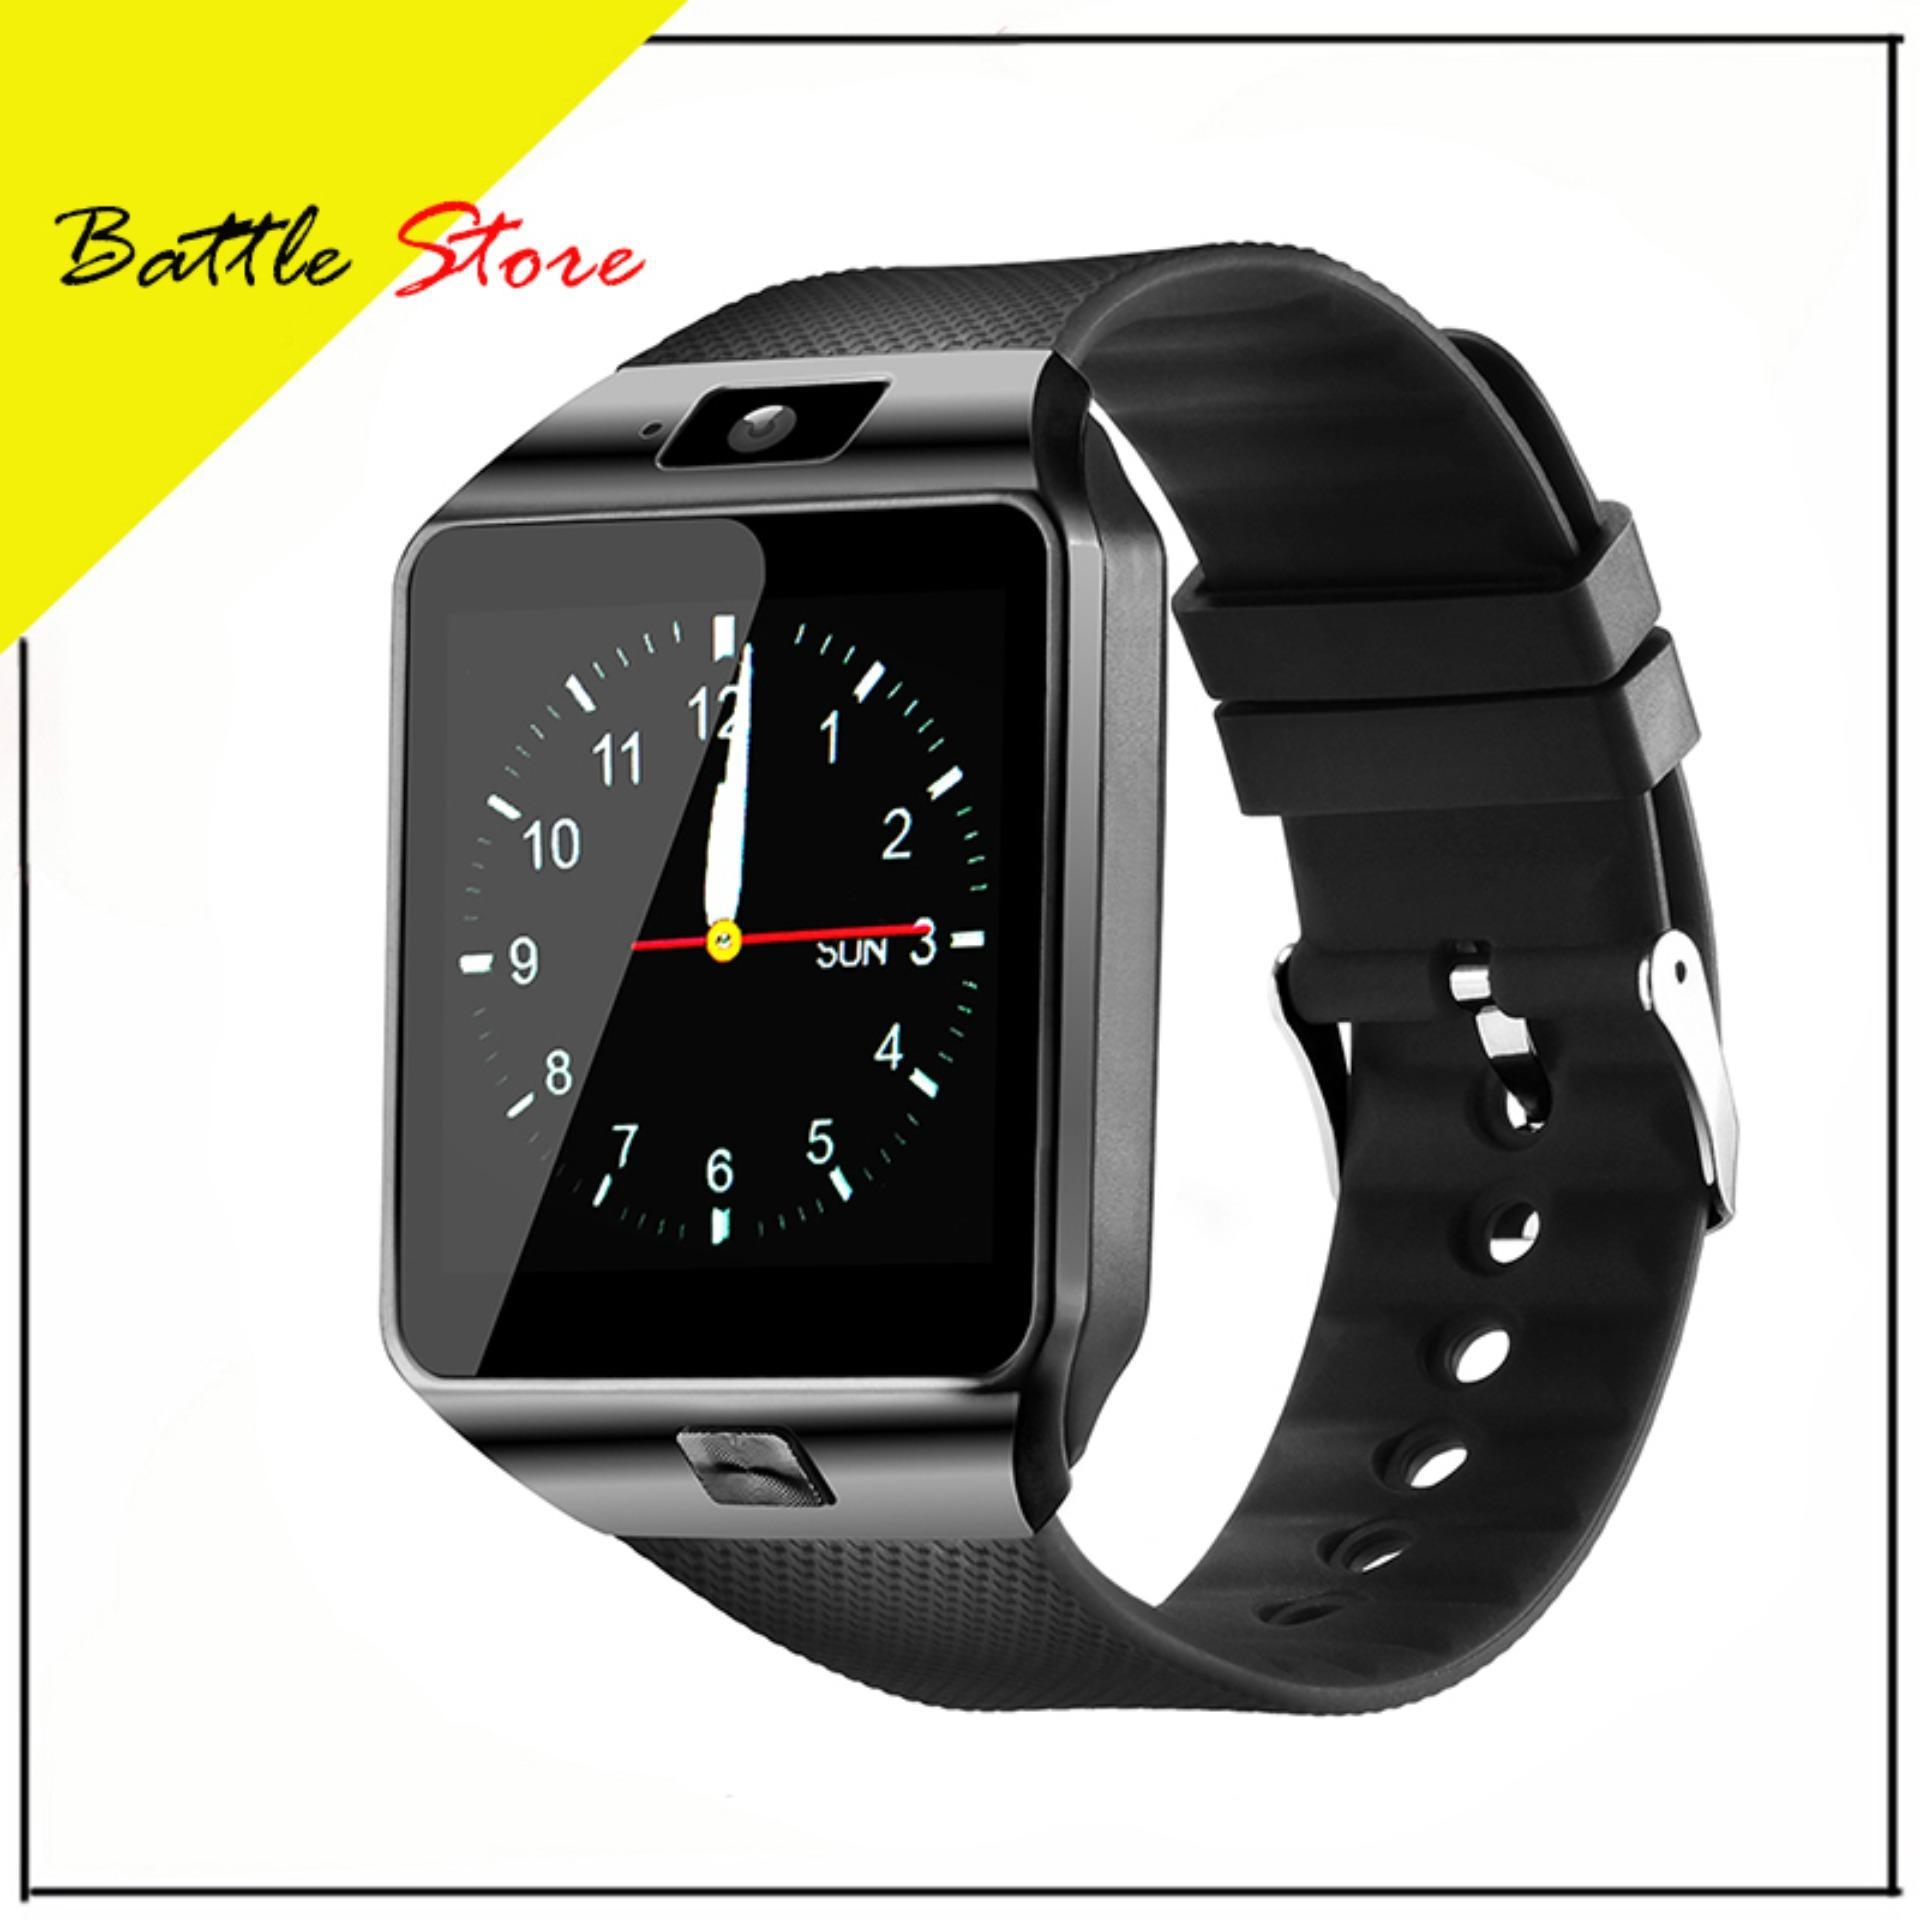 Smartwatch U9 / DZ09 / Smart Watch DZ09 Support Sim Card & Memory Card / Jam Tangan Android - Black